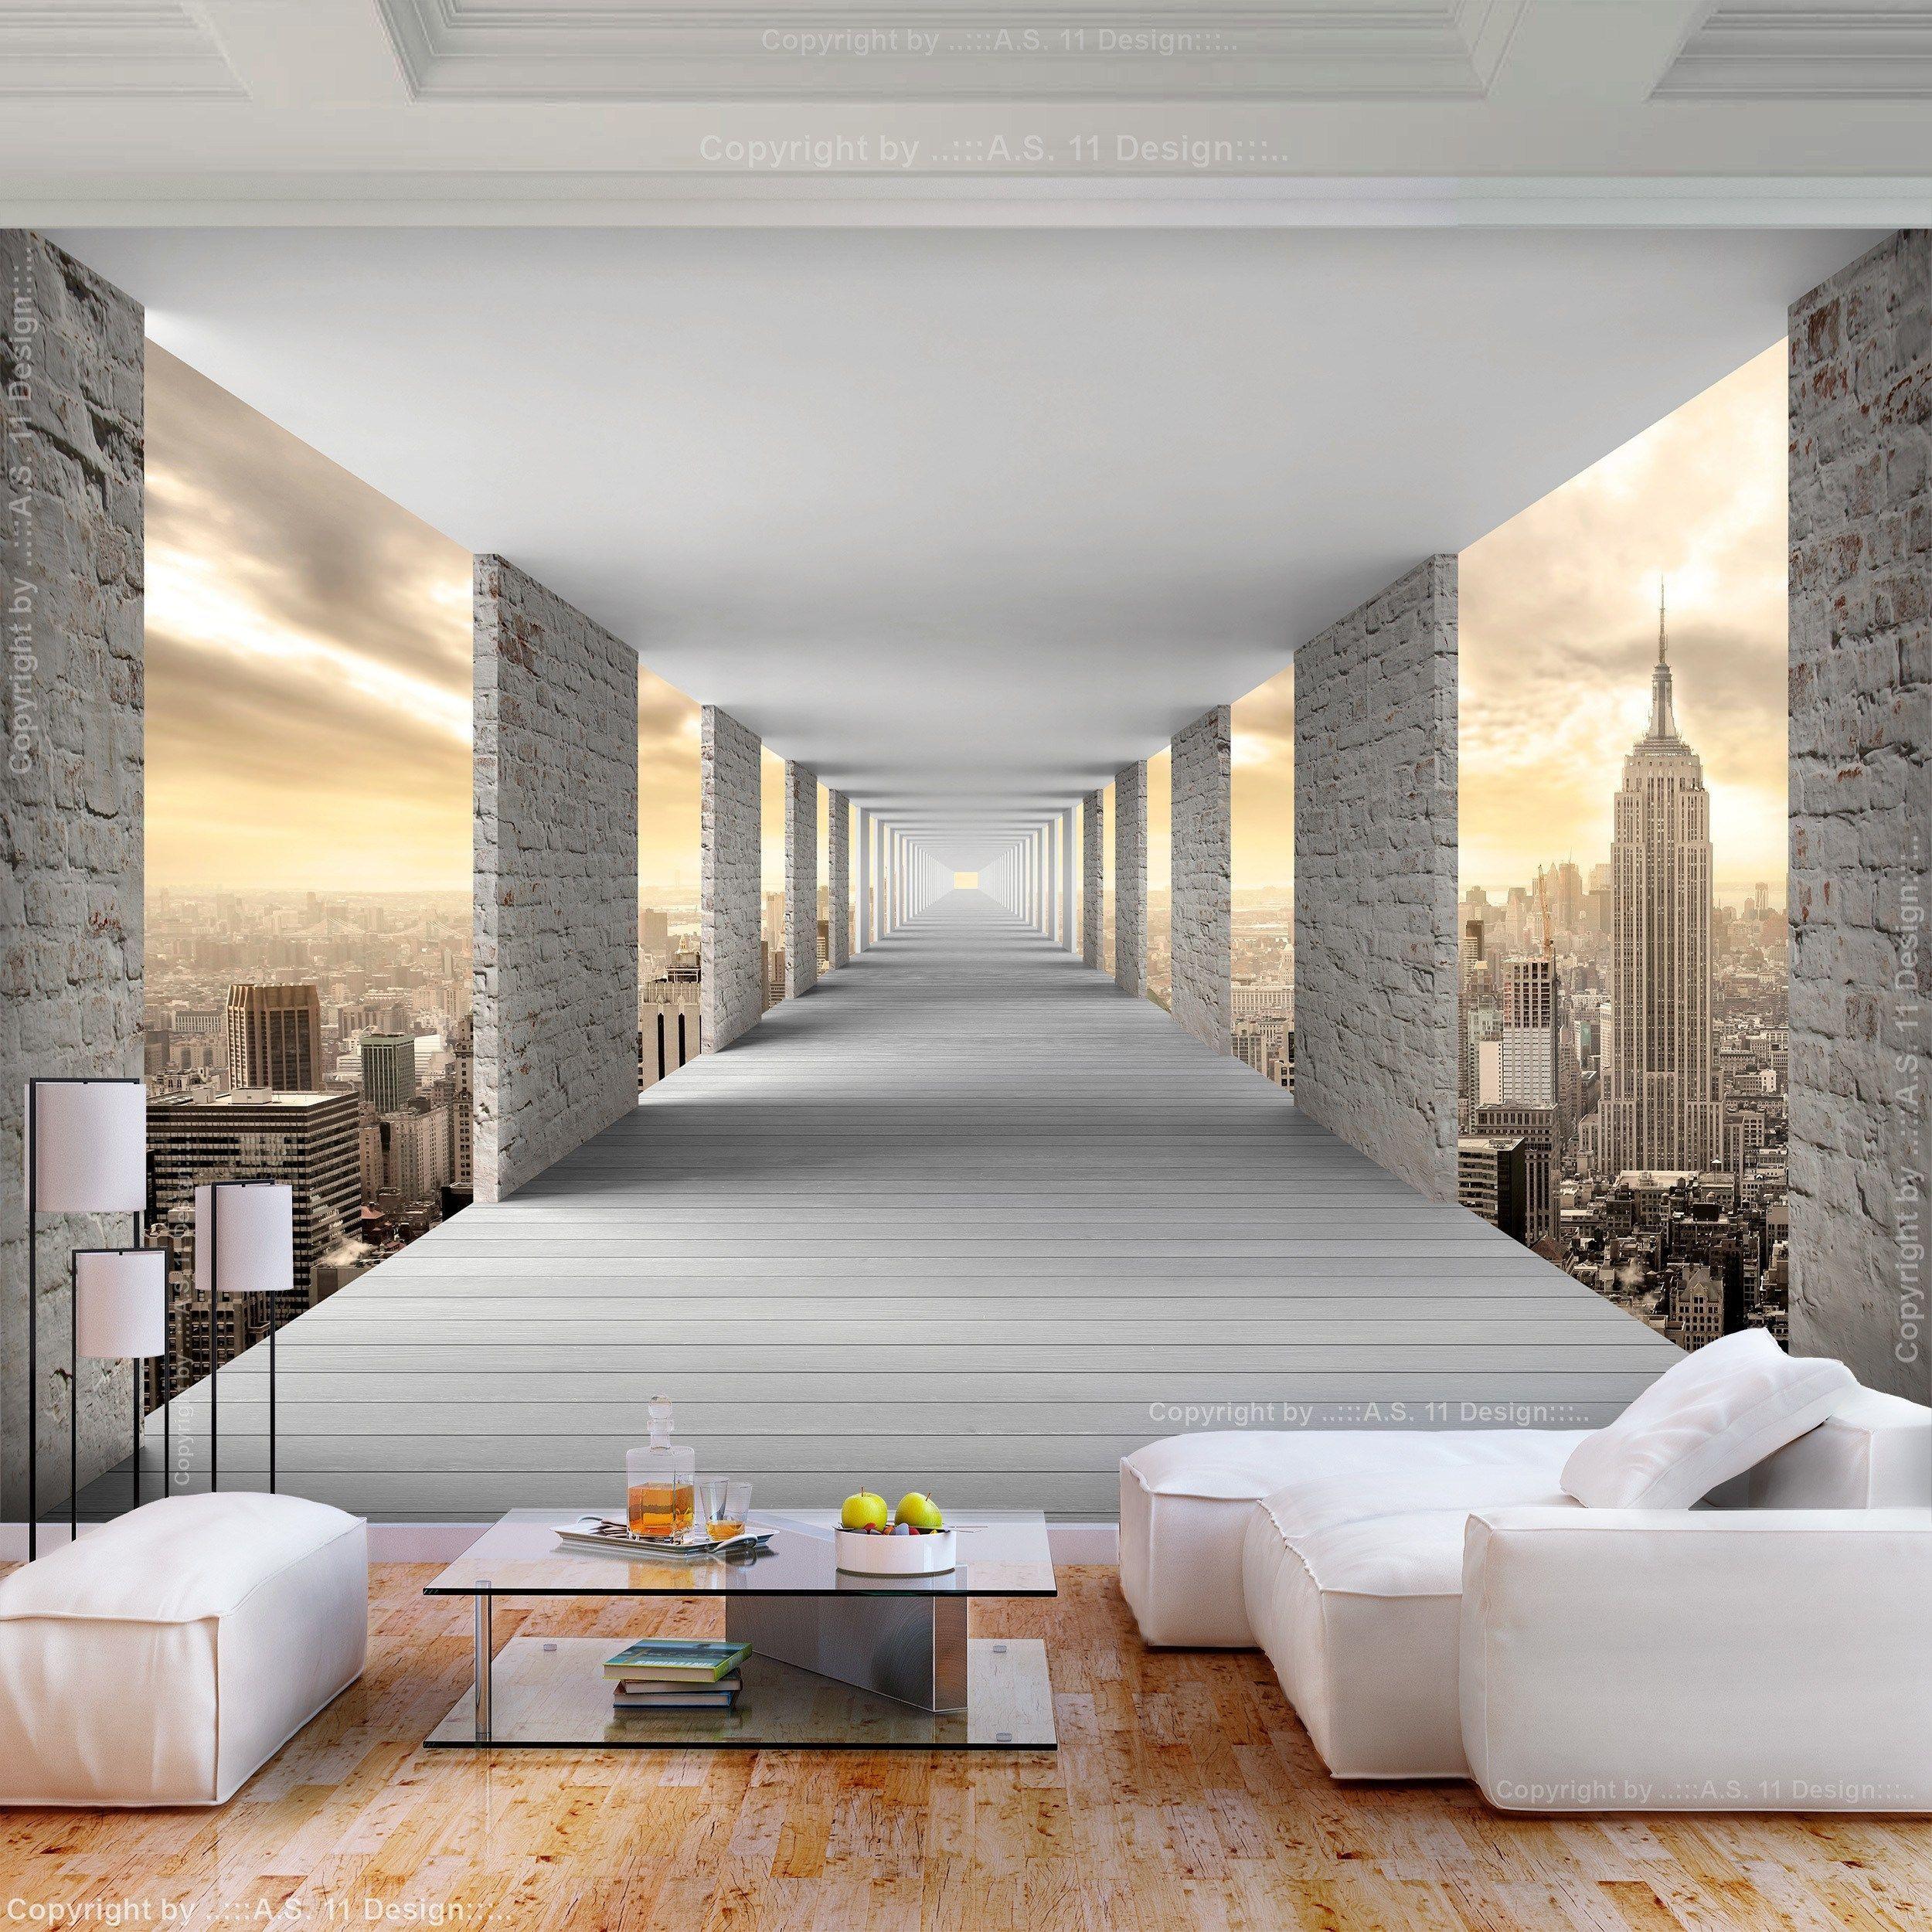 Moderne Leinwandbilder | Moderne Leinwandbilder Wohnzimmer